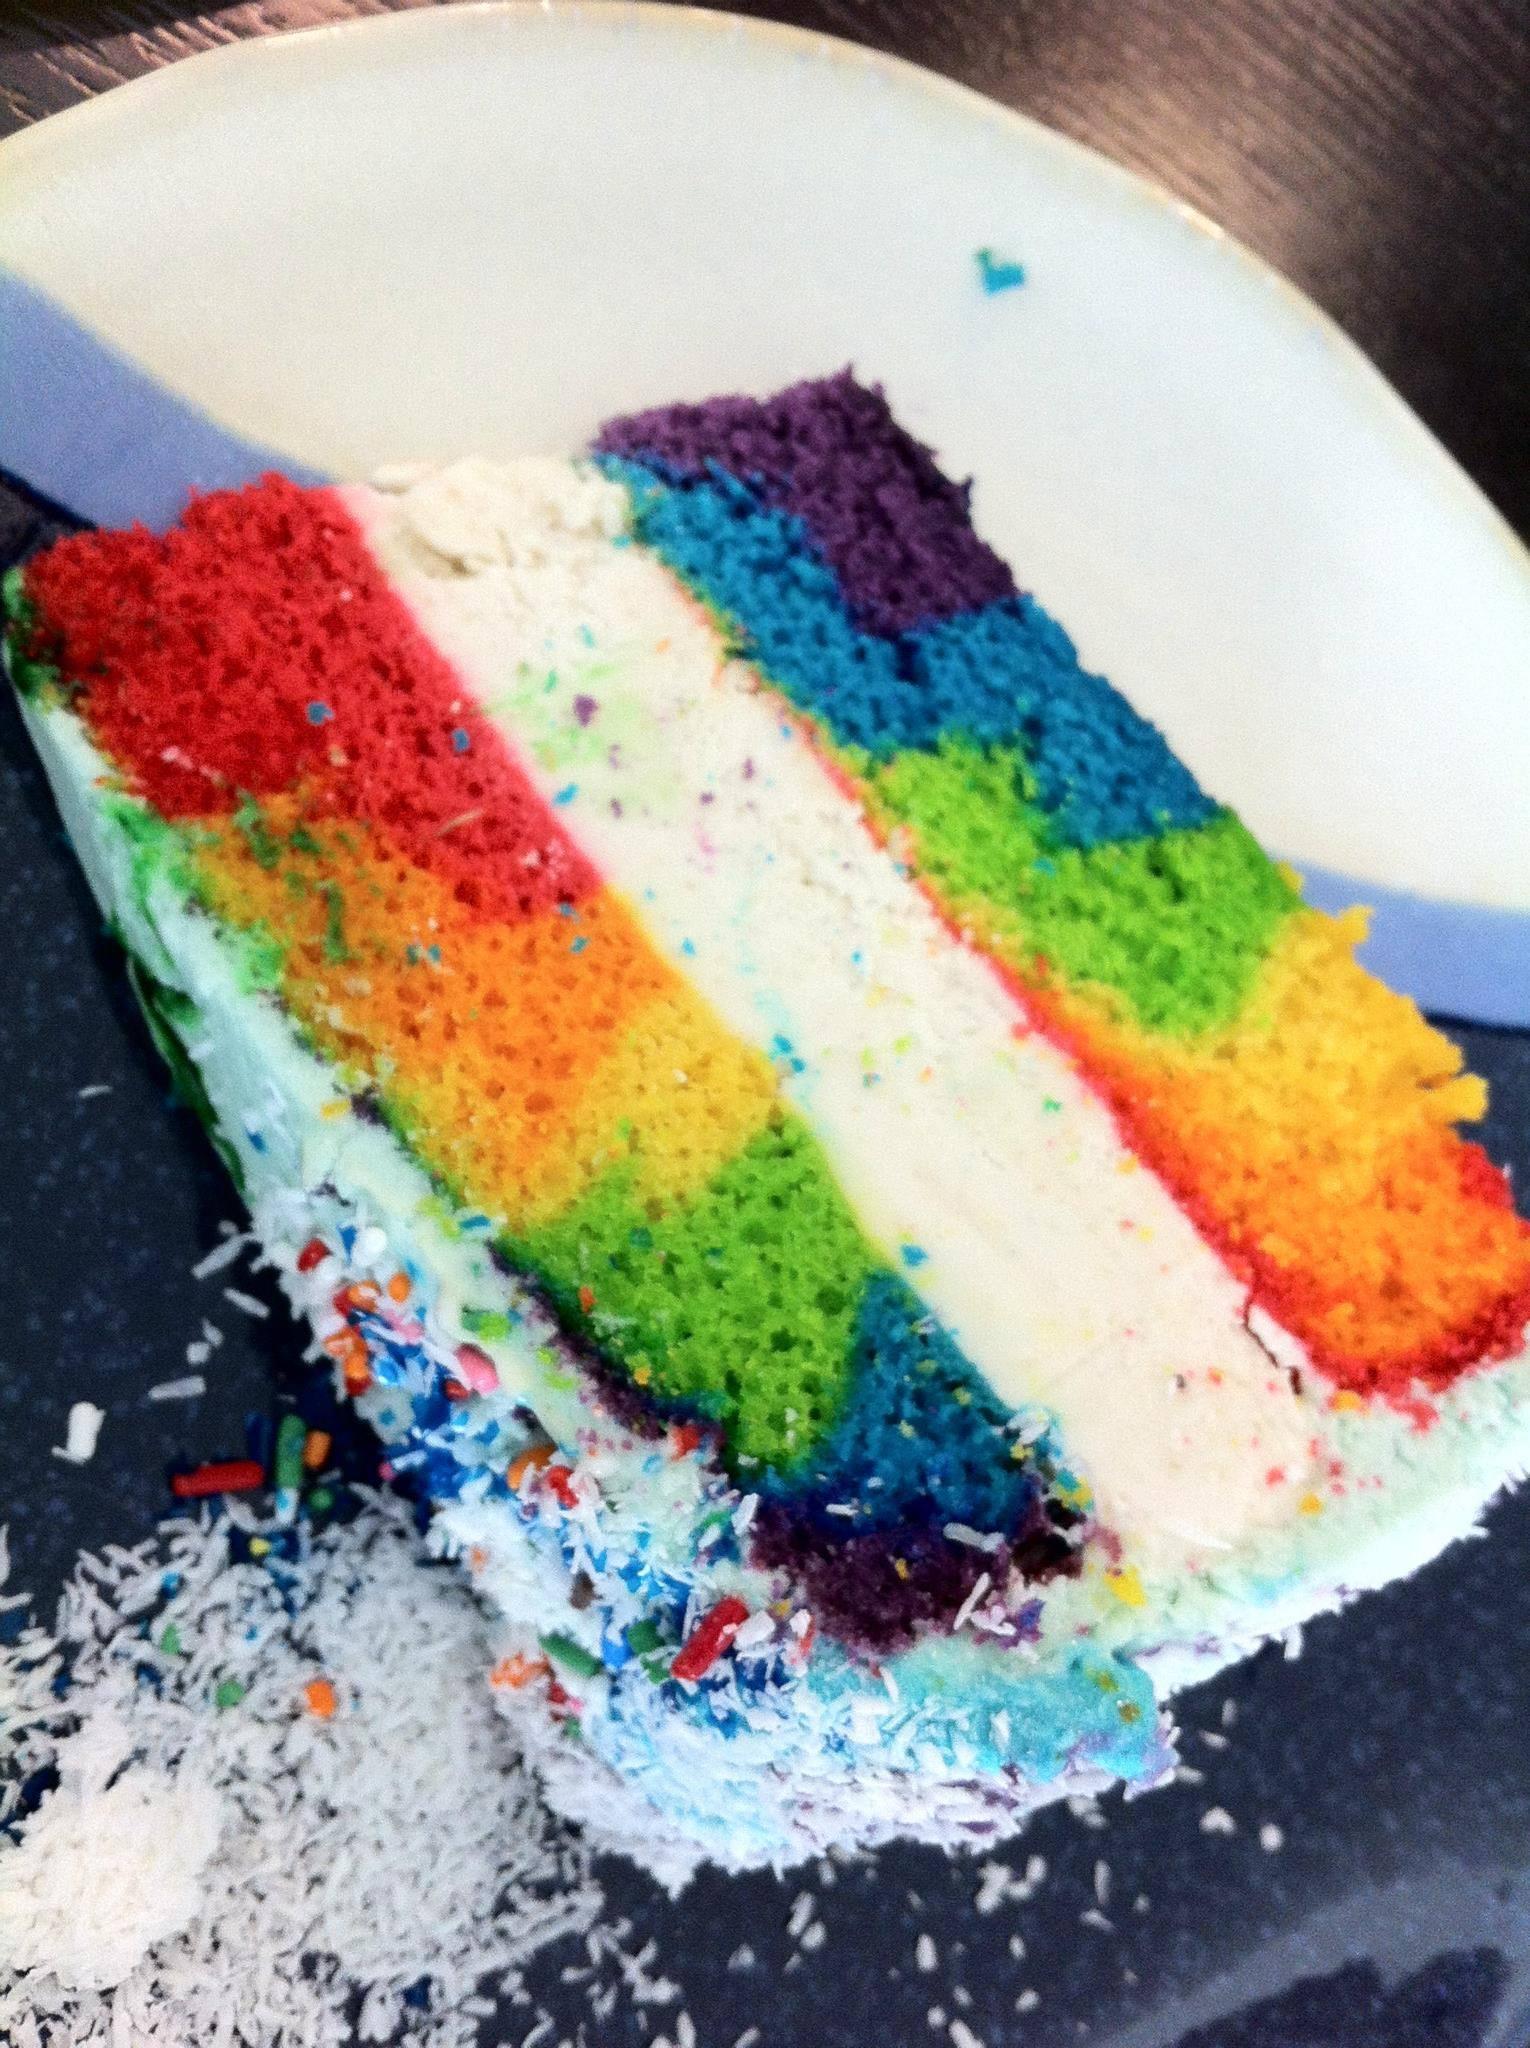 mike's coconut rainbow surprise ice cream cake